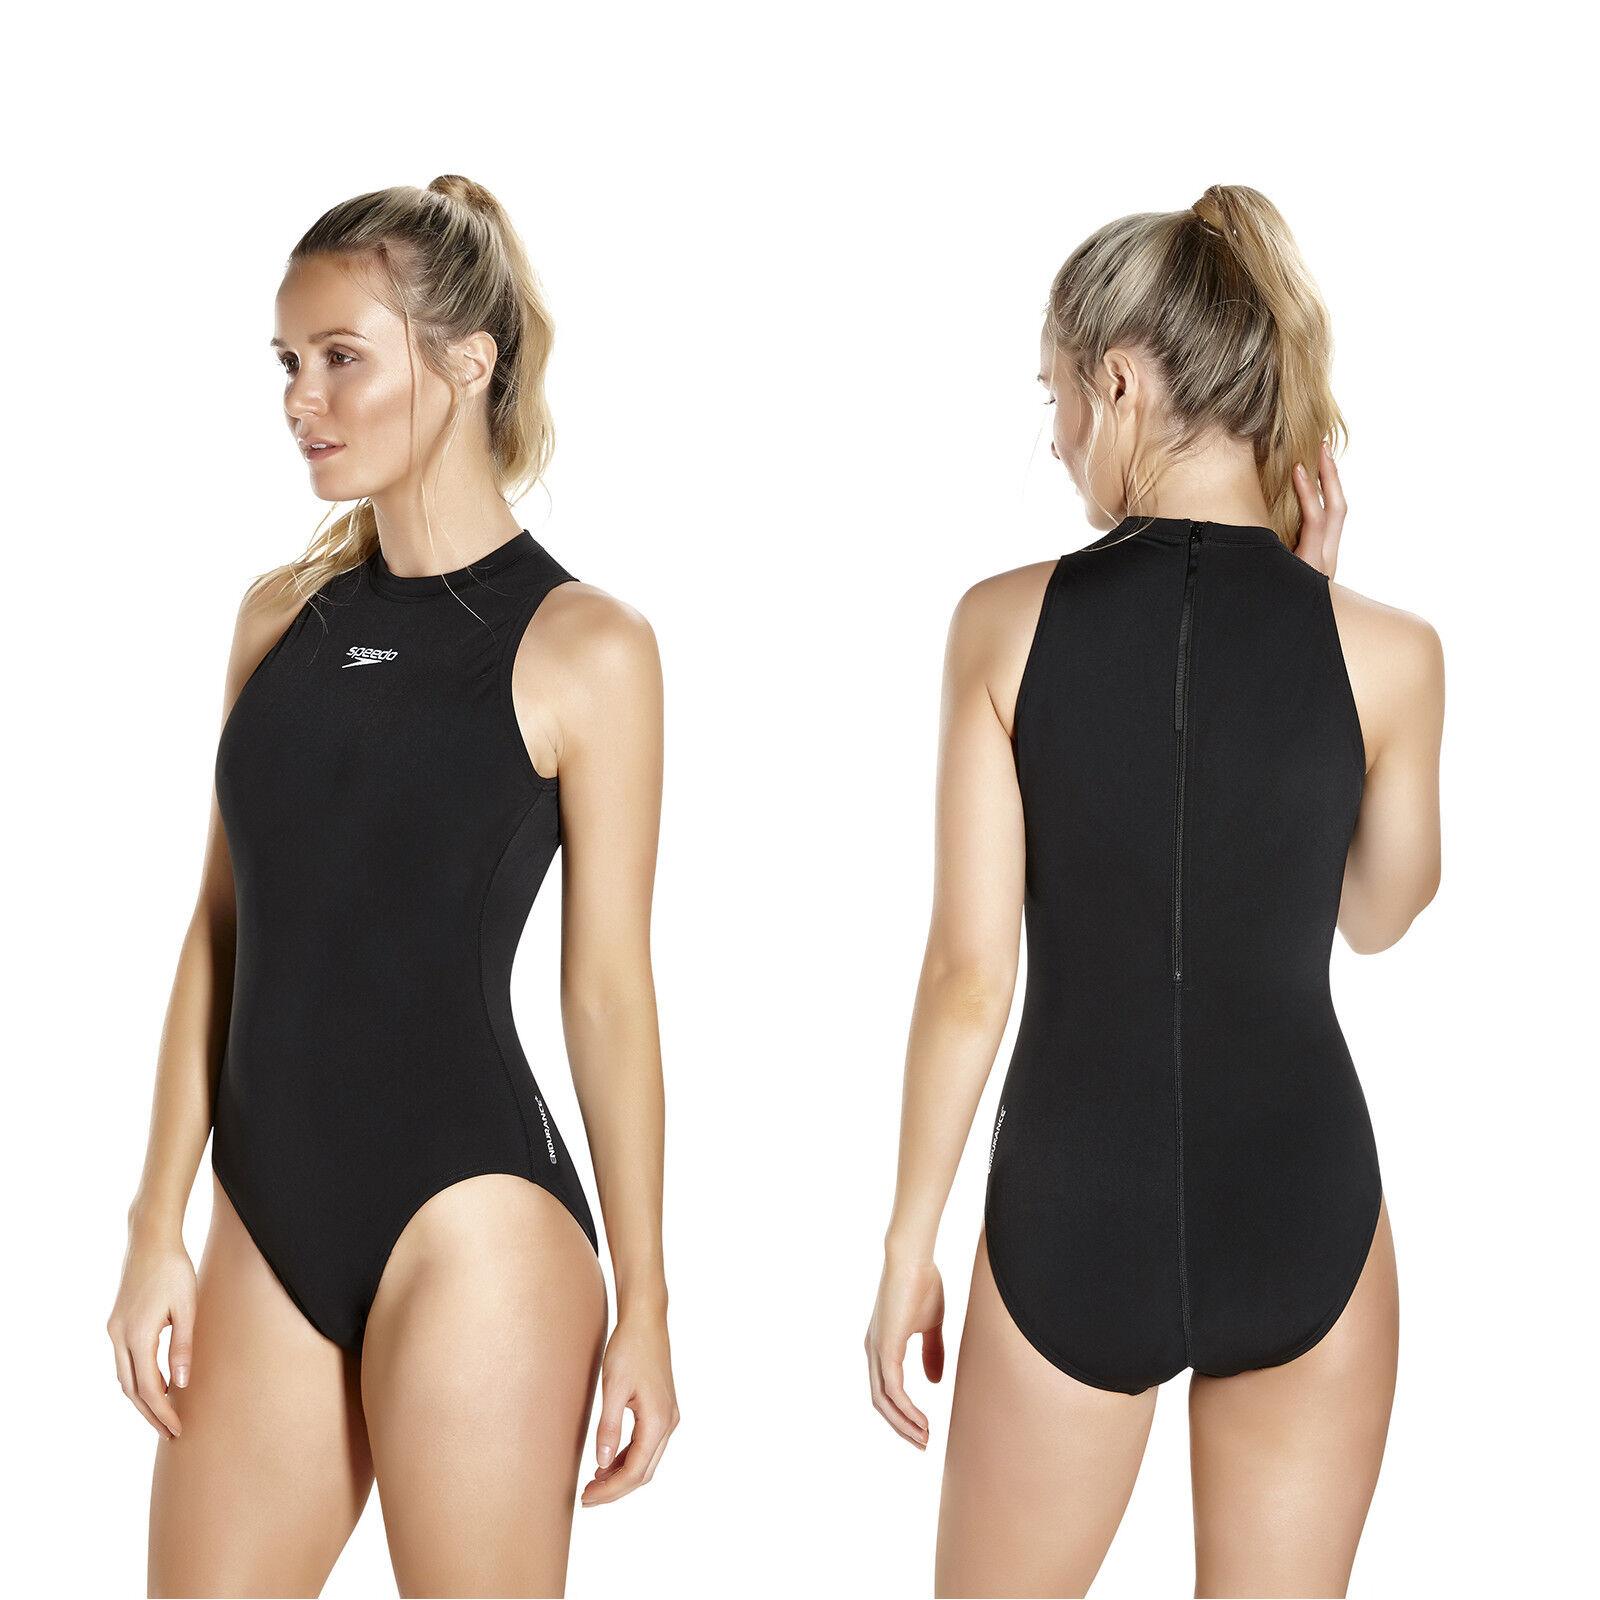 Speedo Badeanzug Schwimmanzug hydrasuit Damen hochgeschlossen Reißverschluss